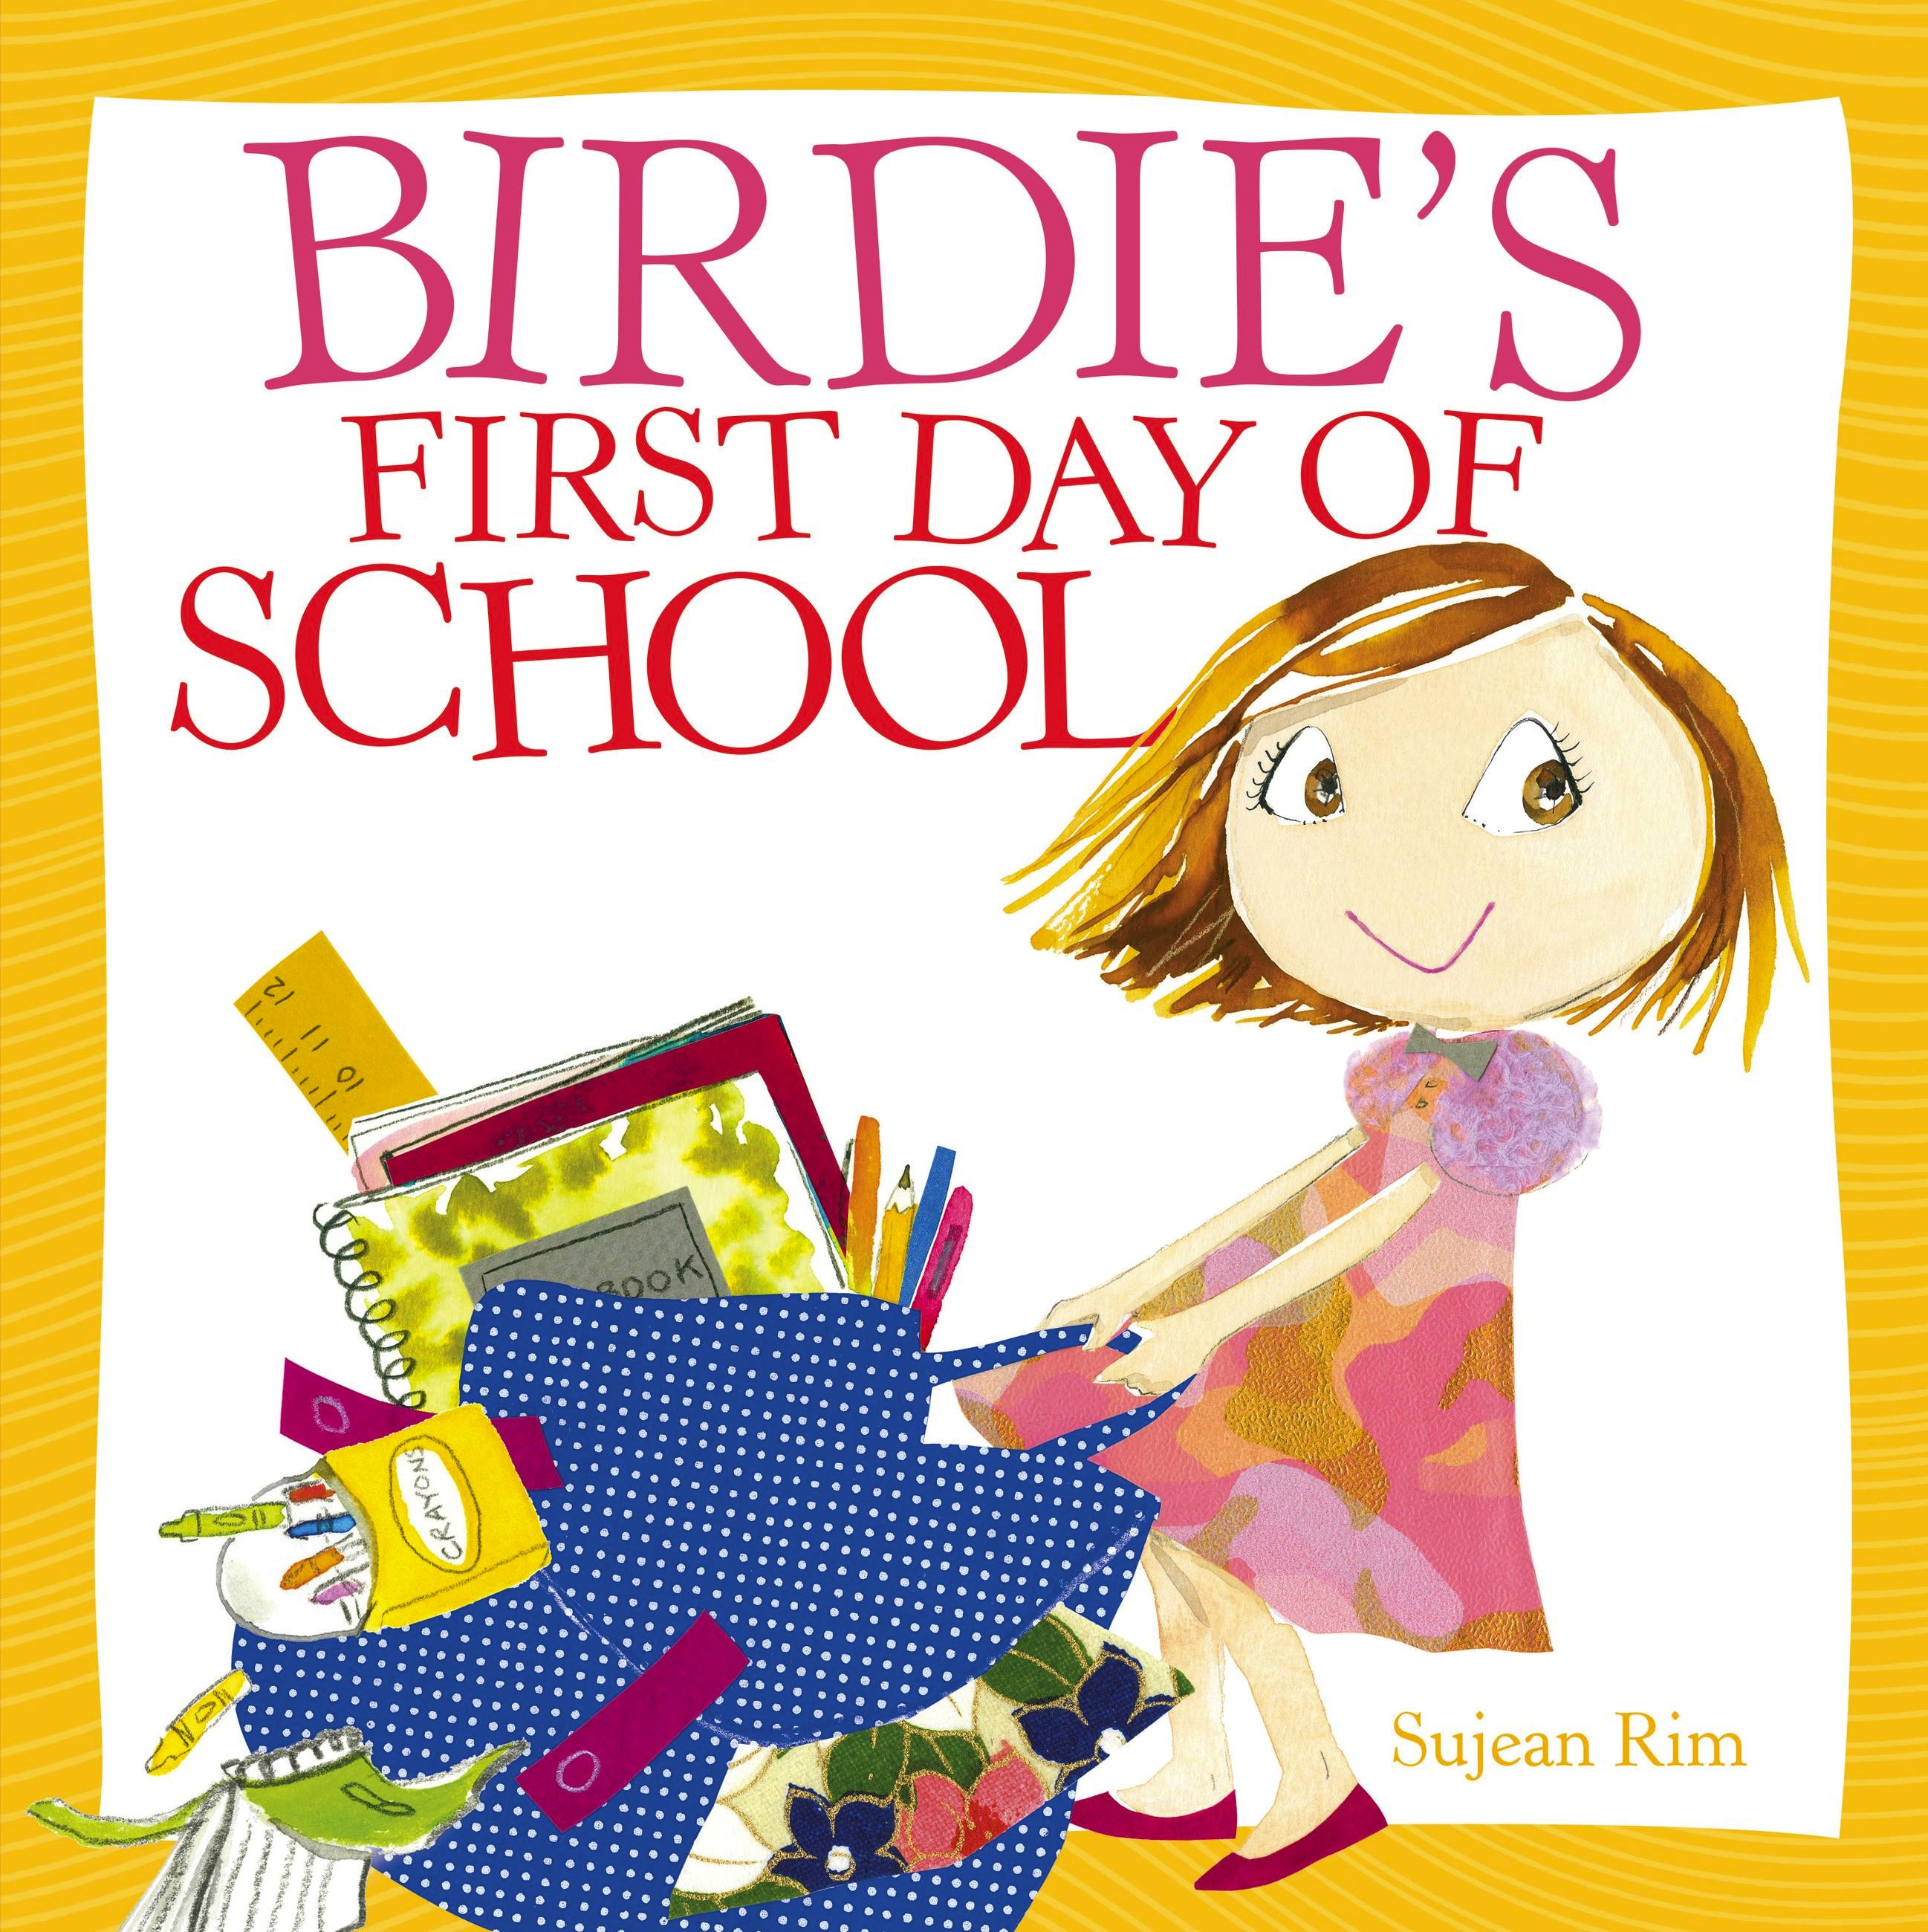 Birdie's First Day of School by Sujean Rim | Hachette Book ...